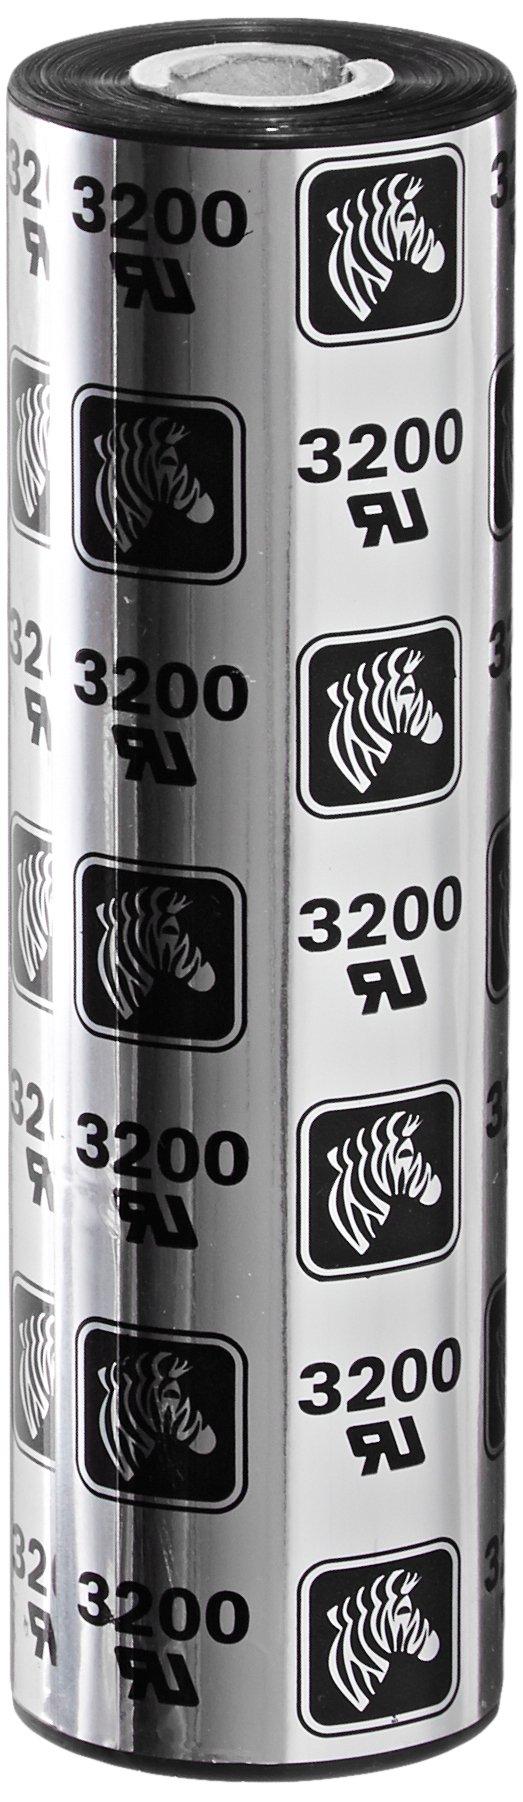 Zebra Technologies 03200GS11007 3200 Wax Resin Print Ribbon, Thermal Transfer, 4.3'' x 242', 110 mm x 74 m, Black (Pack of 12)